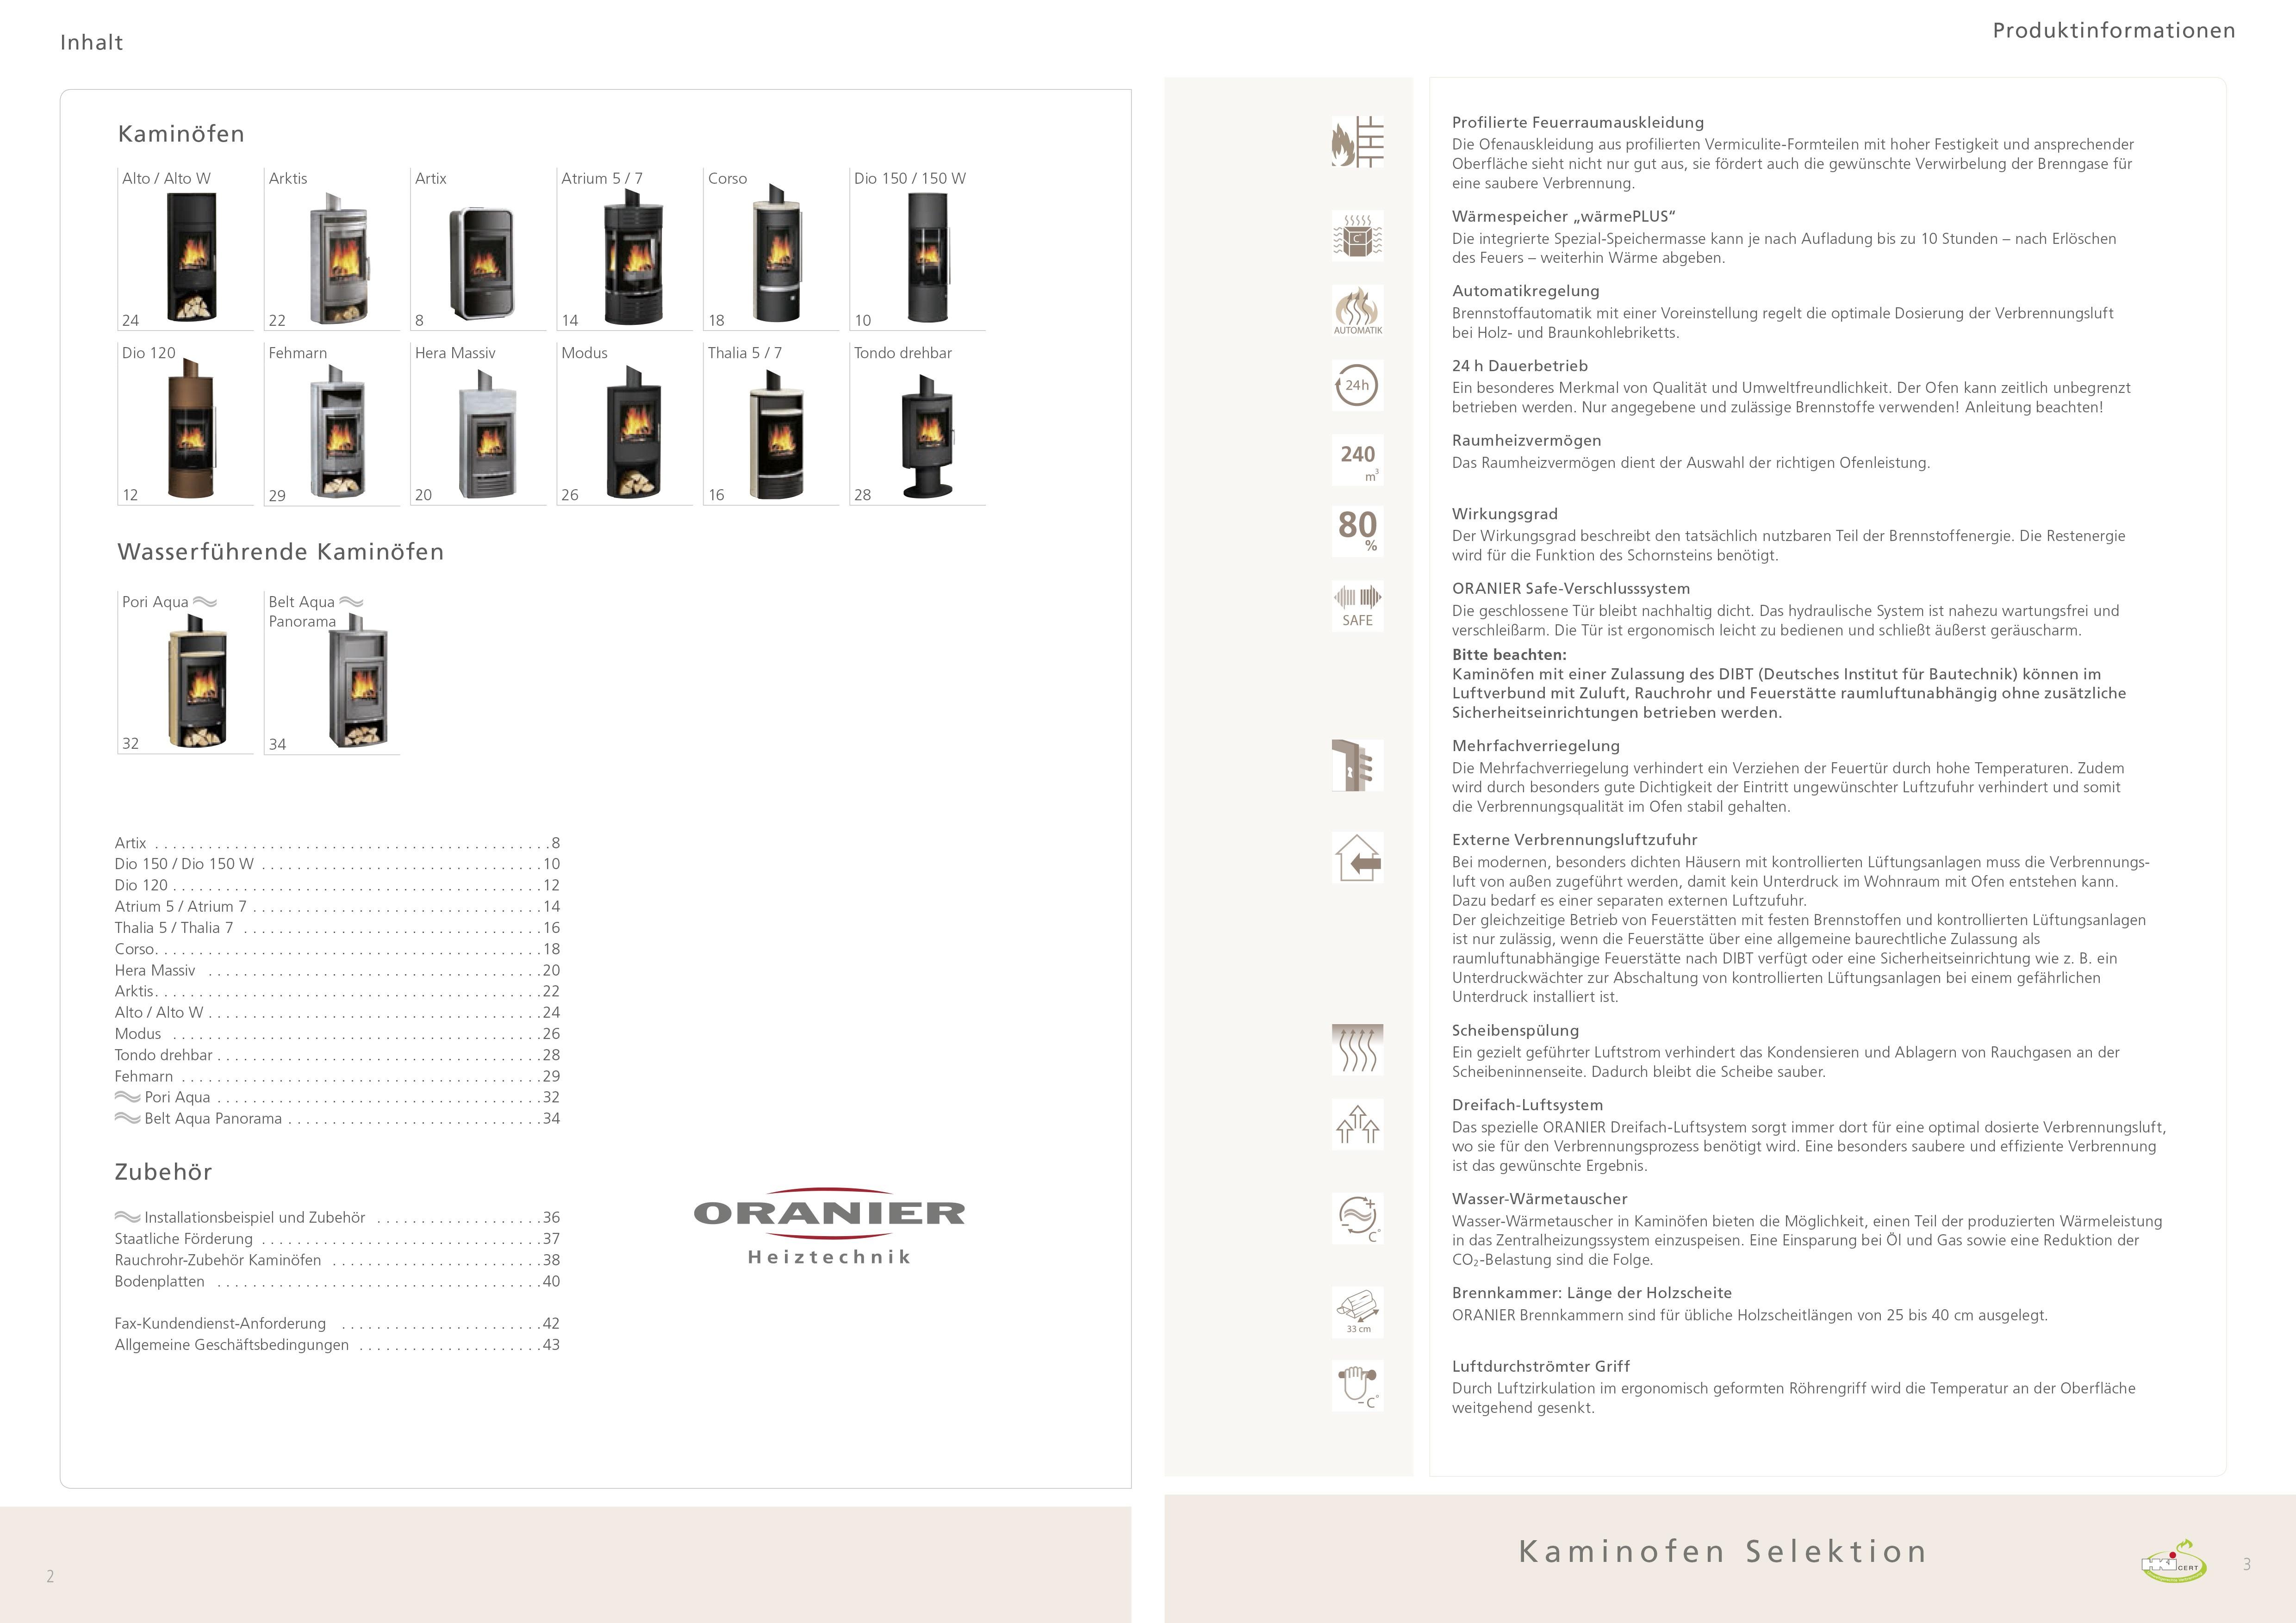 Kaminofen Werksverkauf oranier kaminofen selektion 2014 2015 schweiz